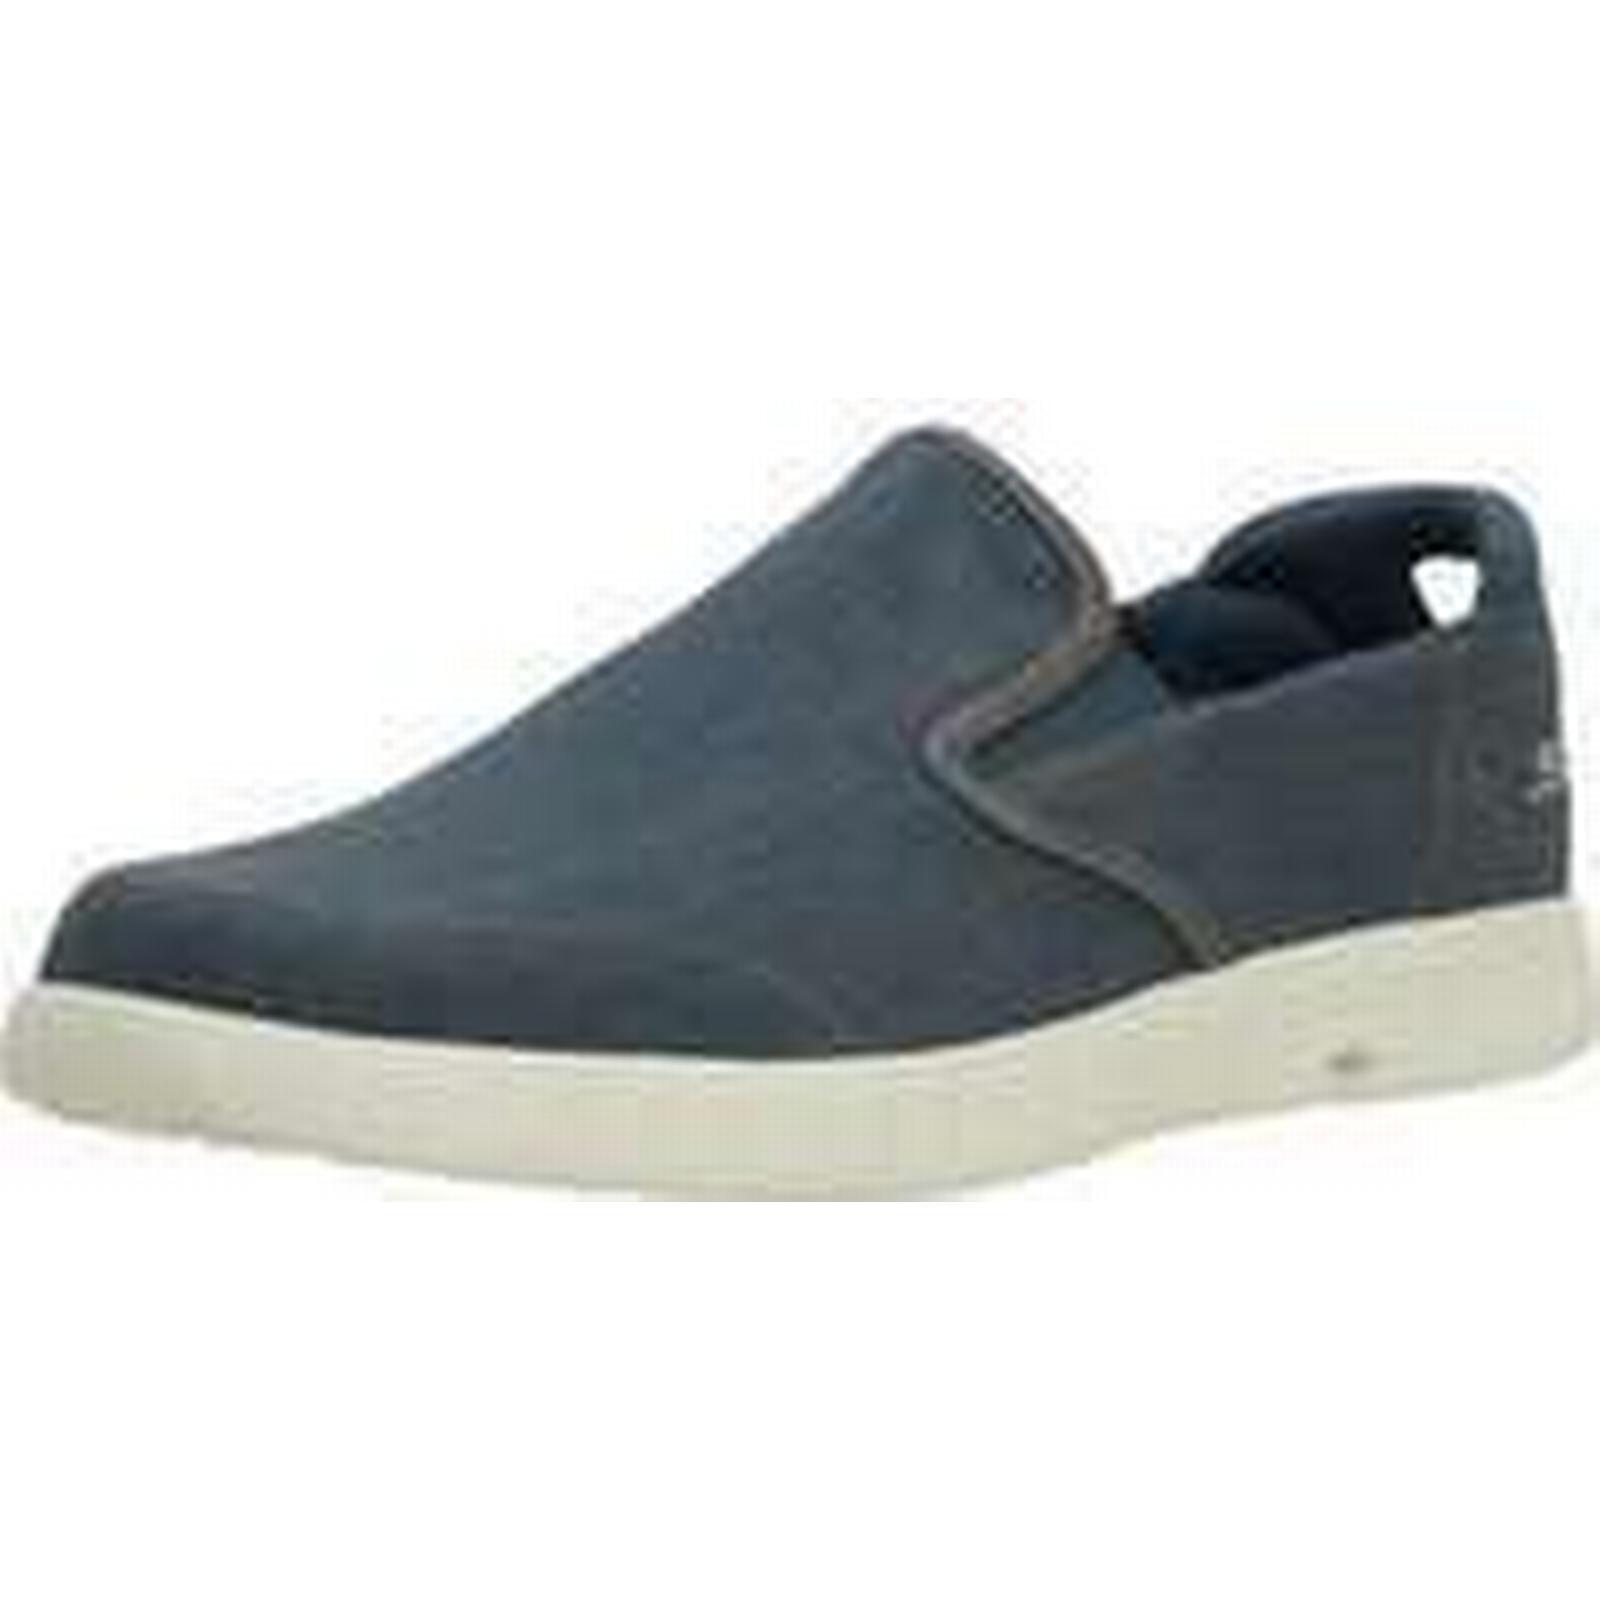 Spartoo.co.uk Skechers ON Slip-ons THE GO GLIDE men's Slip-ons ON (Shoes) in Blue 313c73